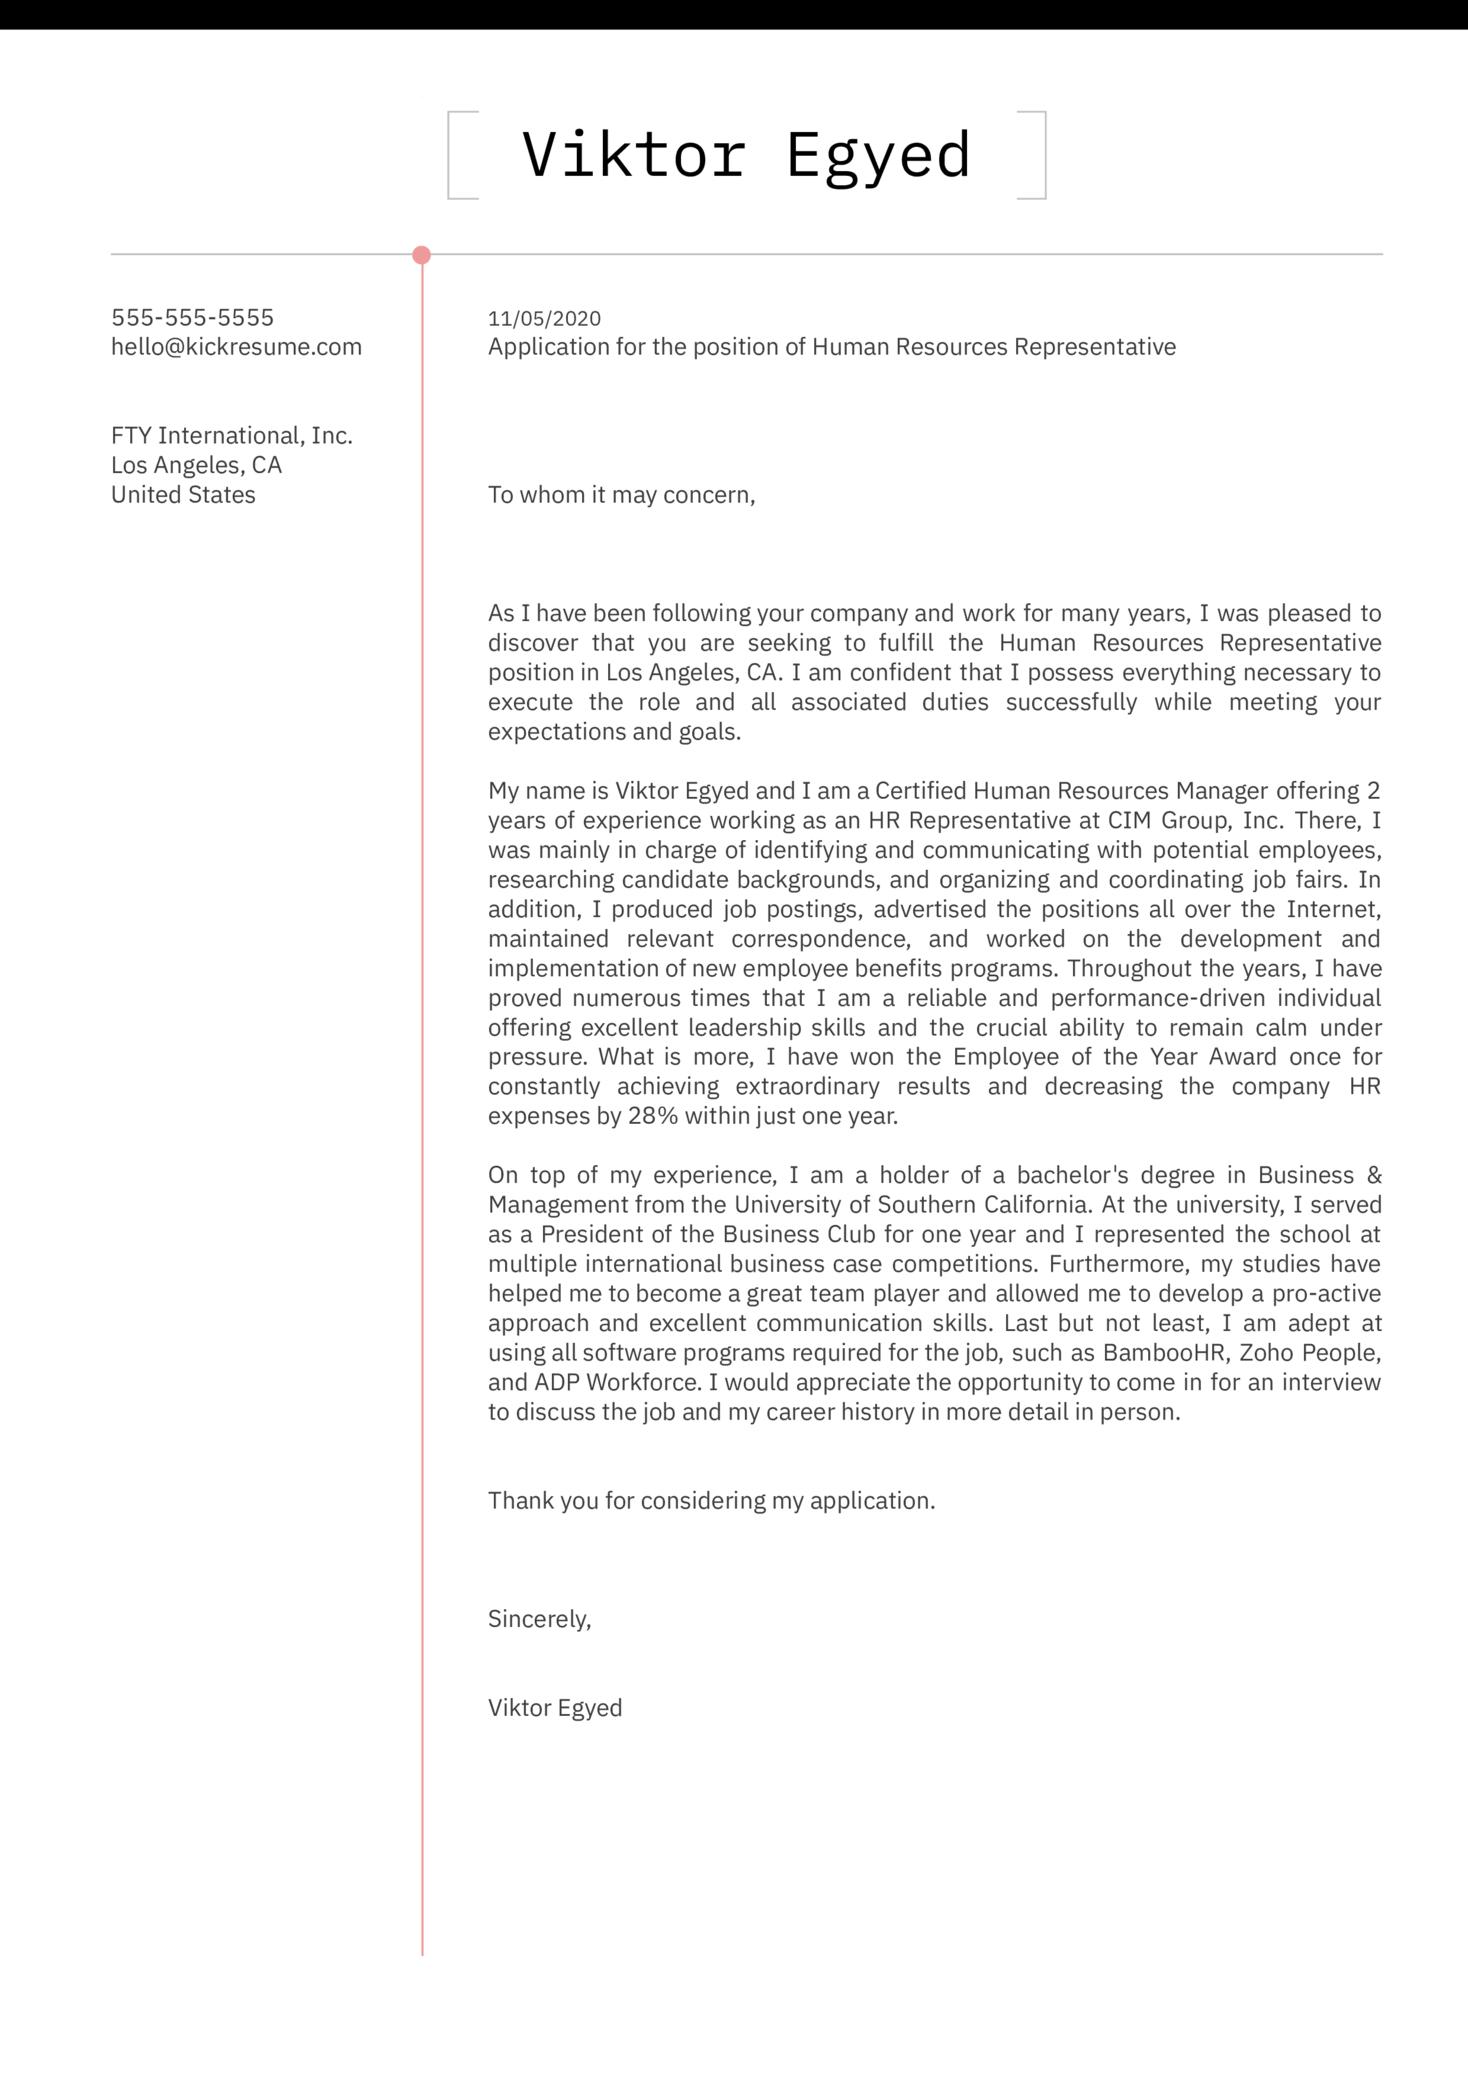 Human Resources Representative Cover Letter Sample